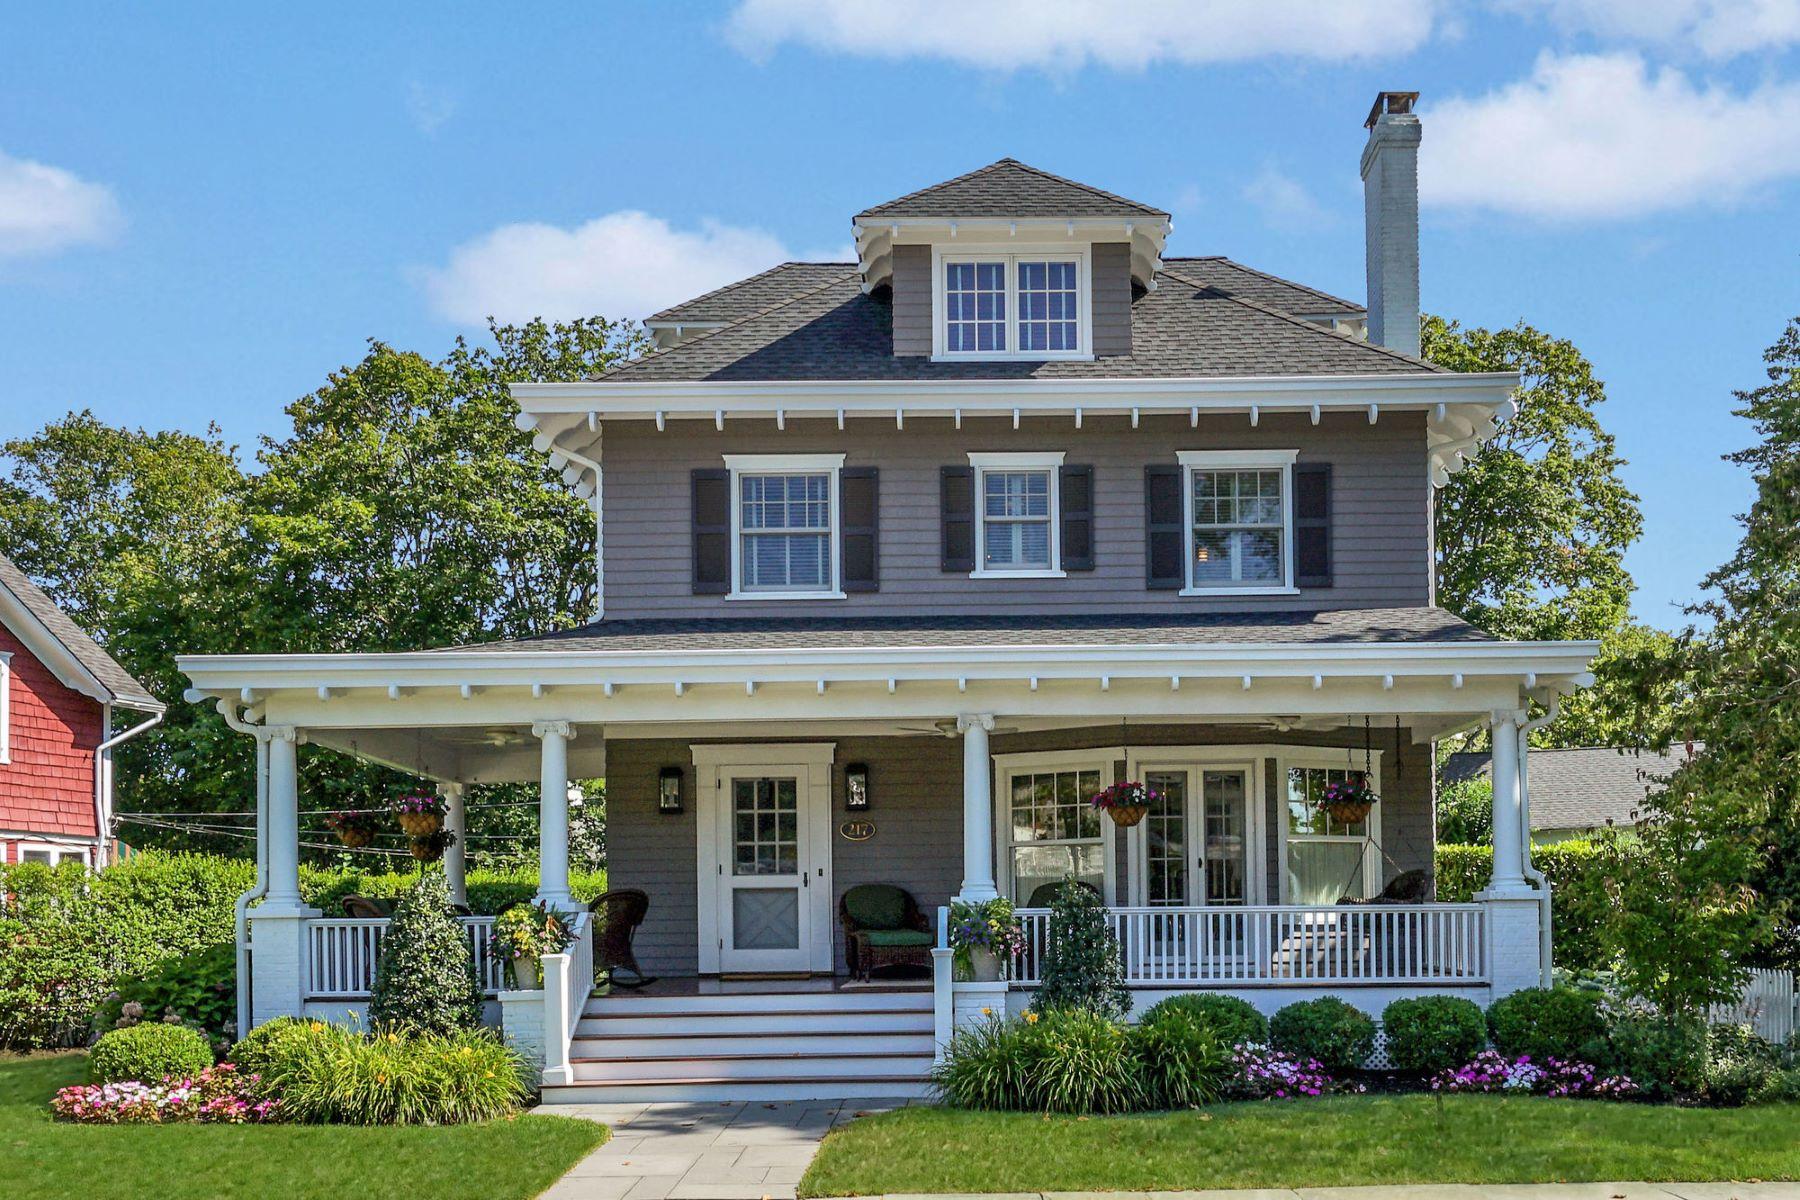 Single Family Homes για την Πώληση στο Quintessential Sea Shore Colonial 217 Brighton Avenue, Spring Lake, Νιου Τζερσεϋ 07762 Ηνωμένες Πολιτείες